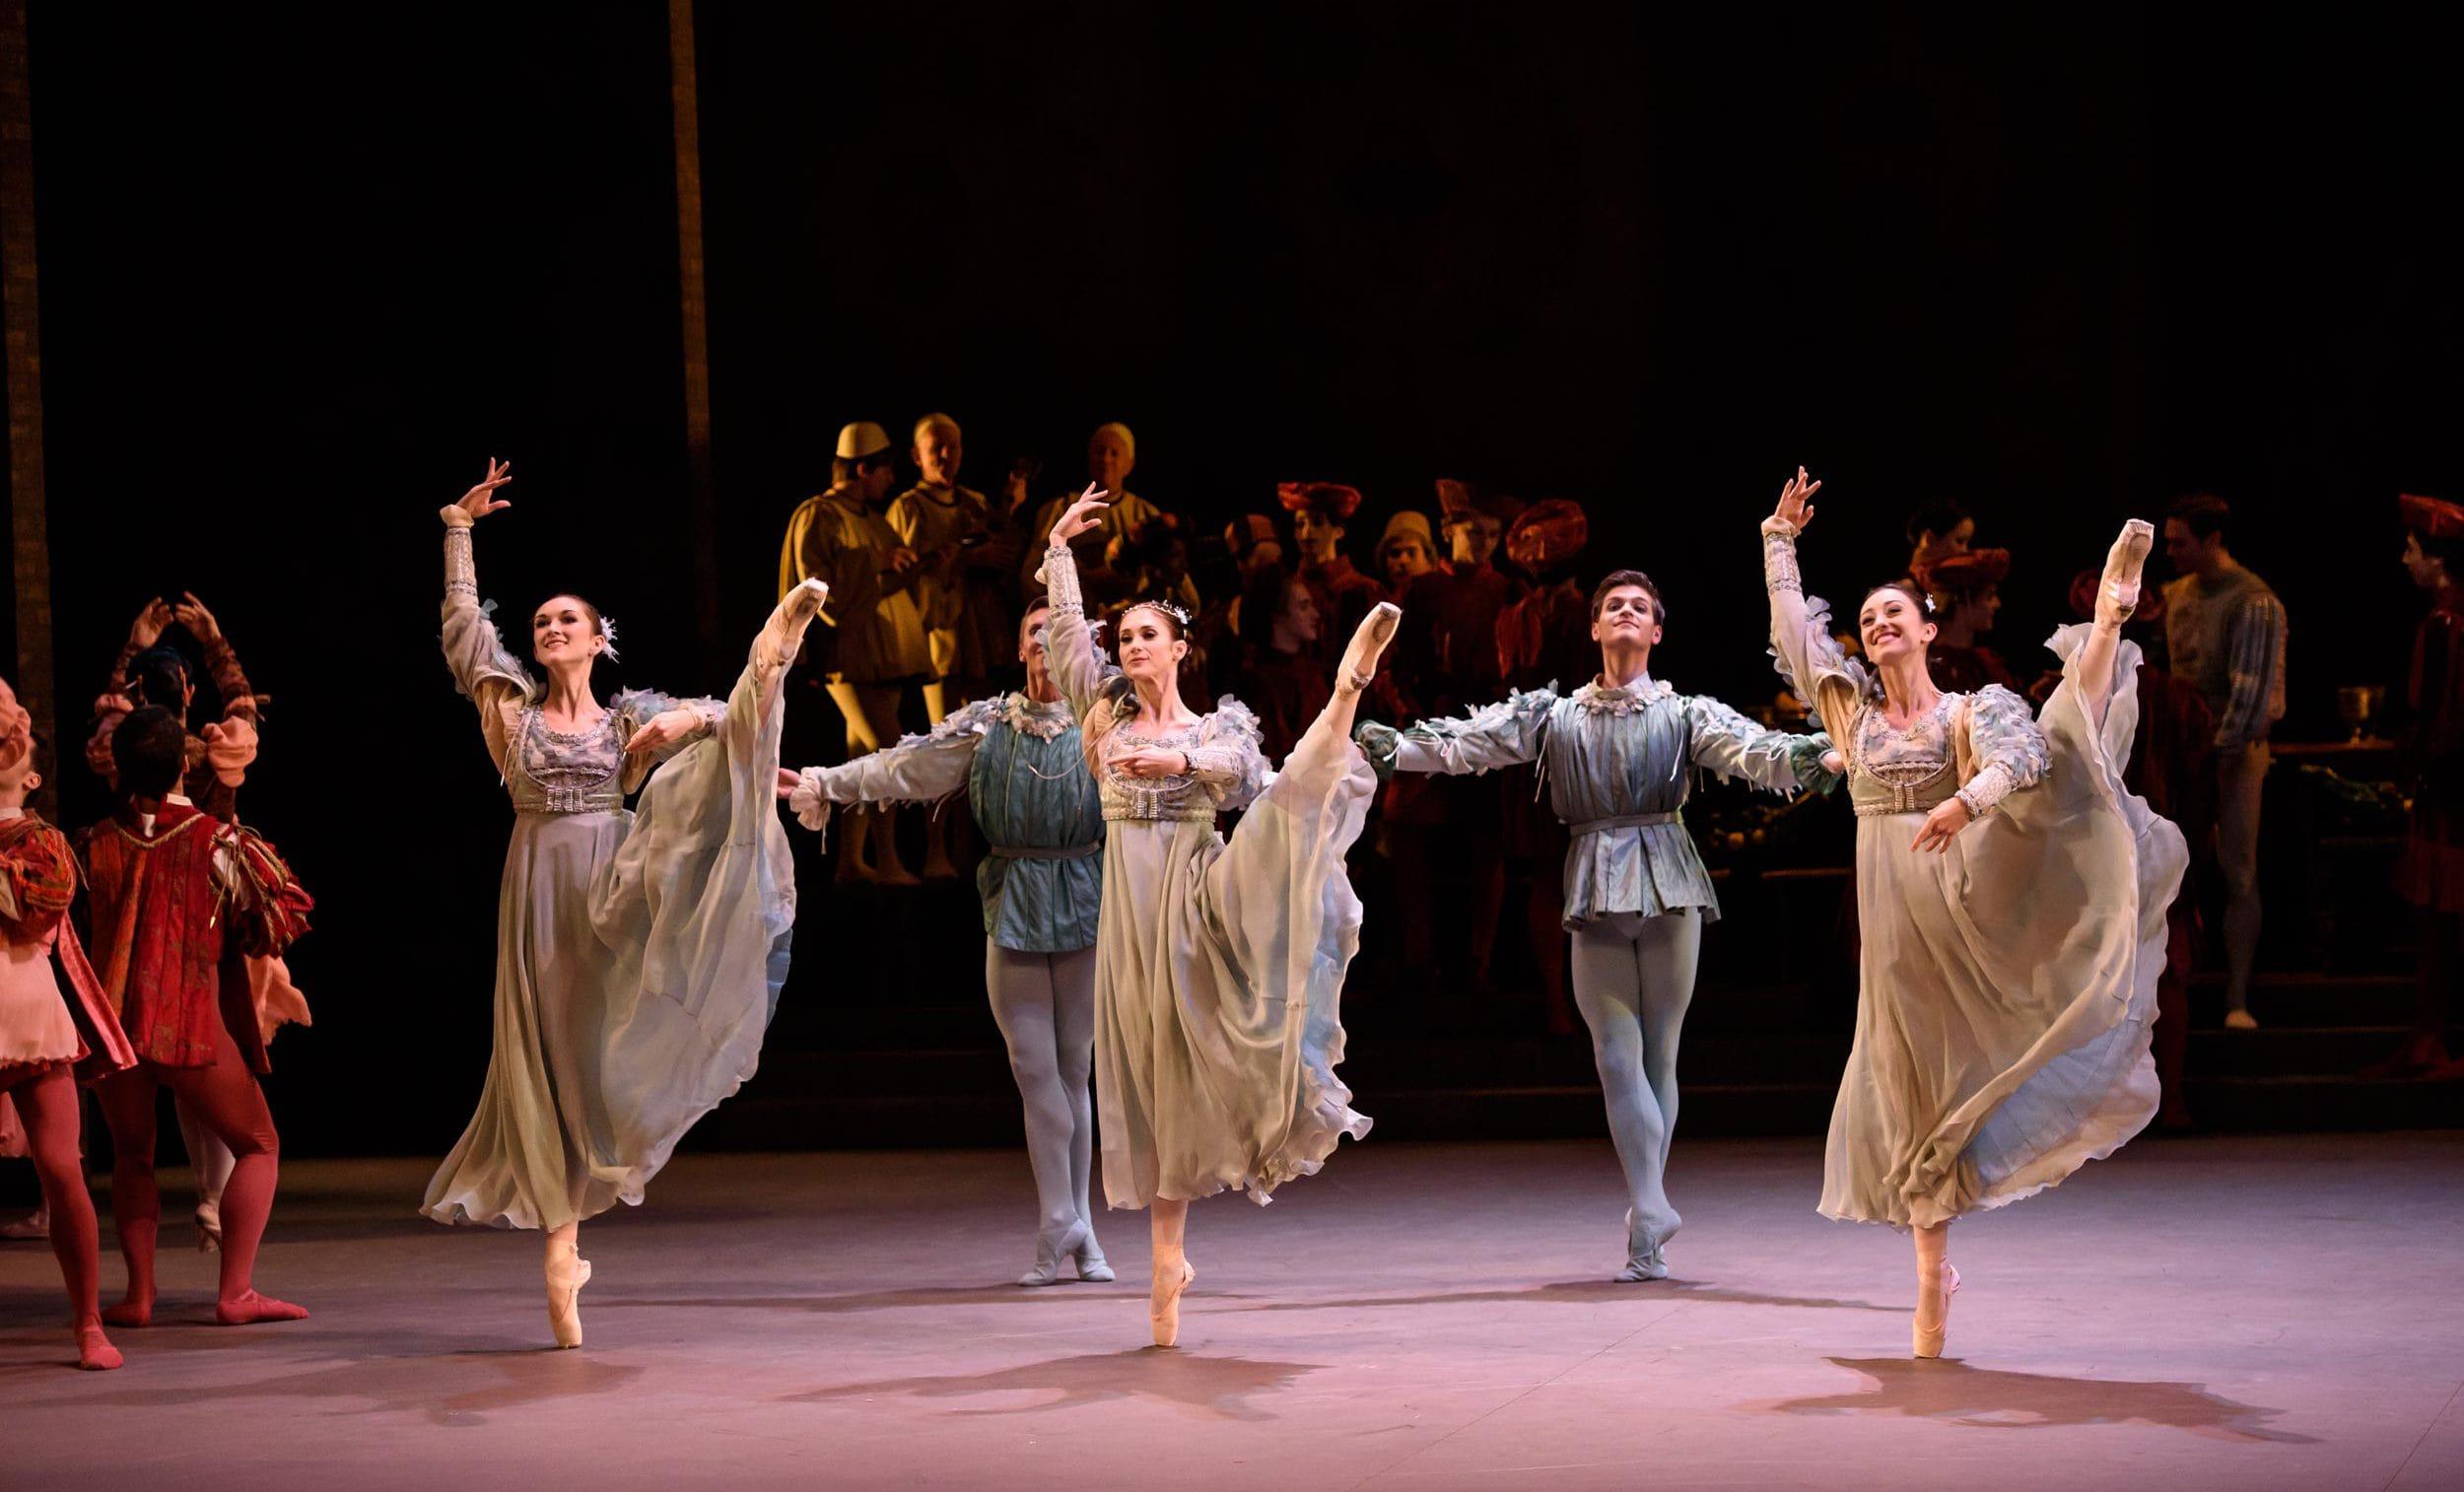 Jeanette-Kakareka,-Alison-McWhinney-and-Madison-Keesler-in-English-National-Ballet's-Romeo-&-Juliet-©Bill-Cooper-(3)